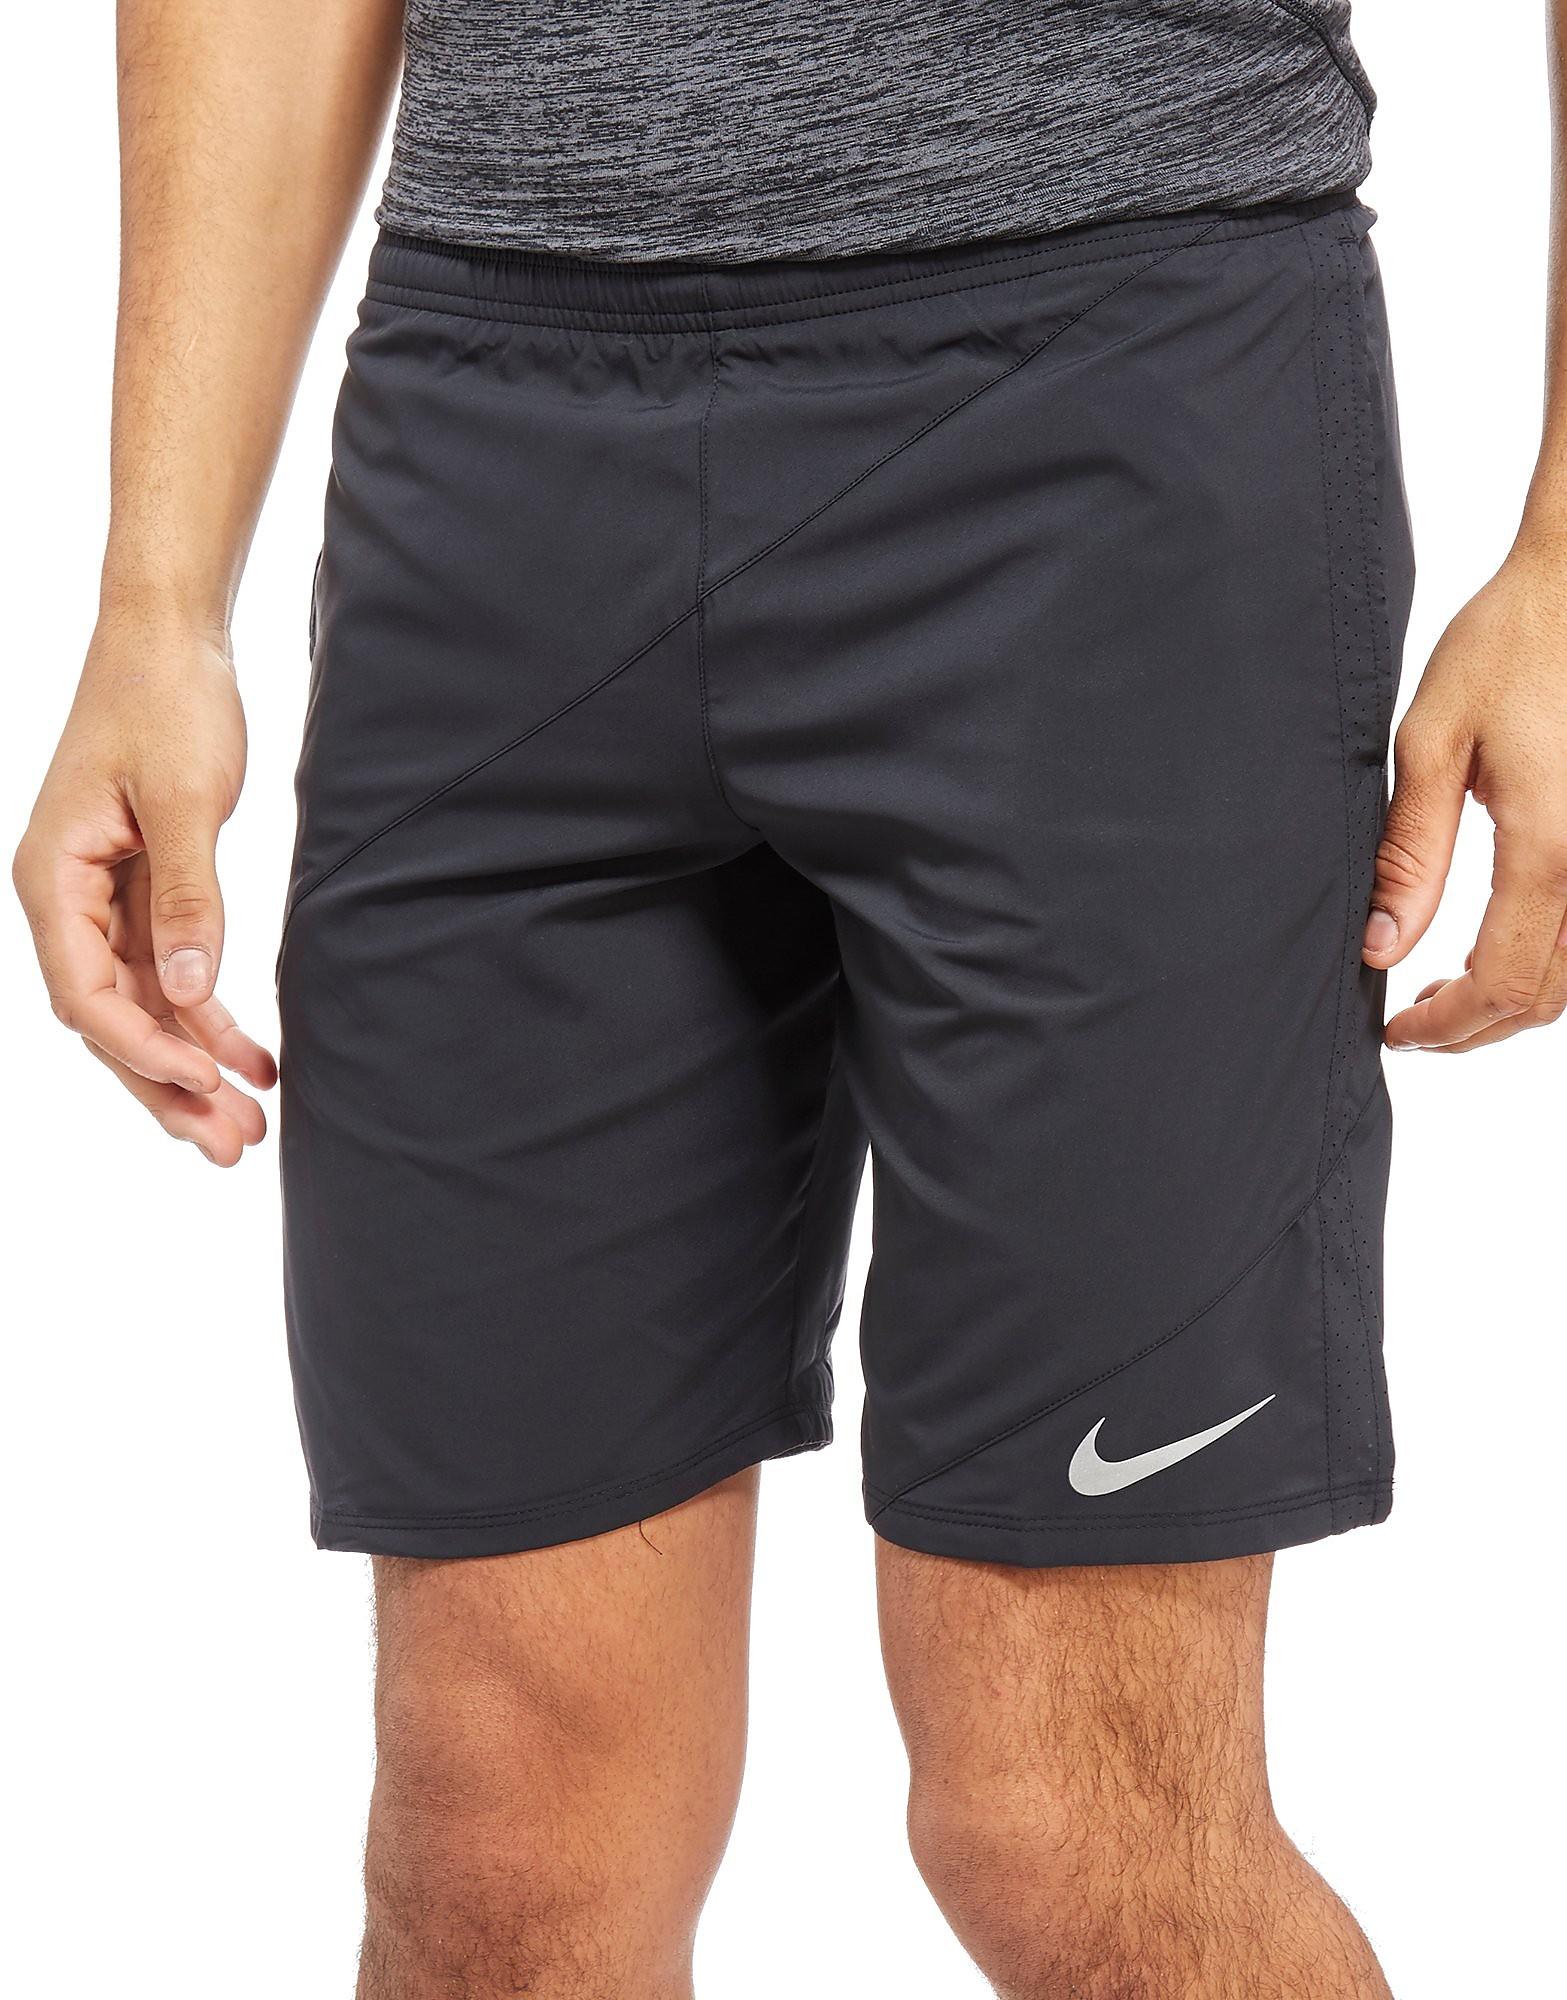 "Nike Distance 9"" Running Shorts"